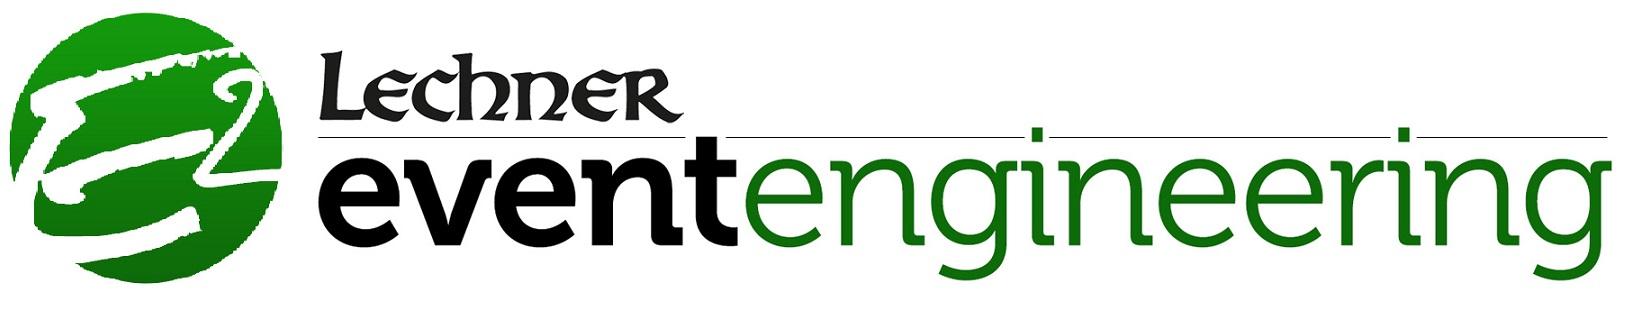 Logo der E2 Event Engineering KG